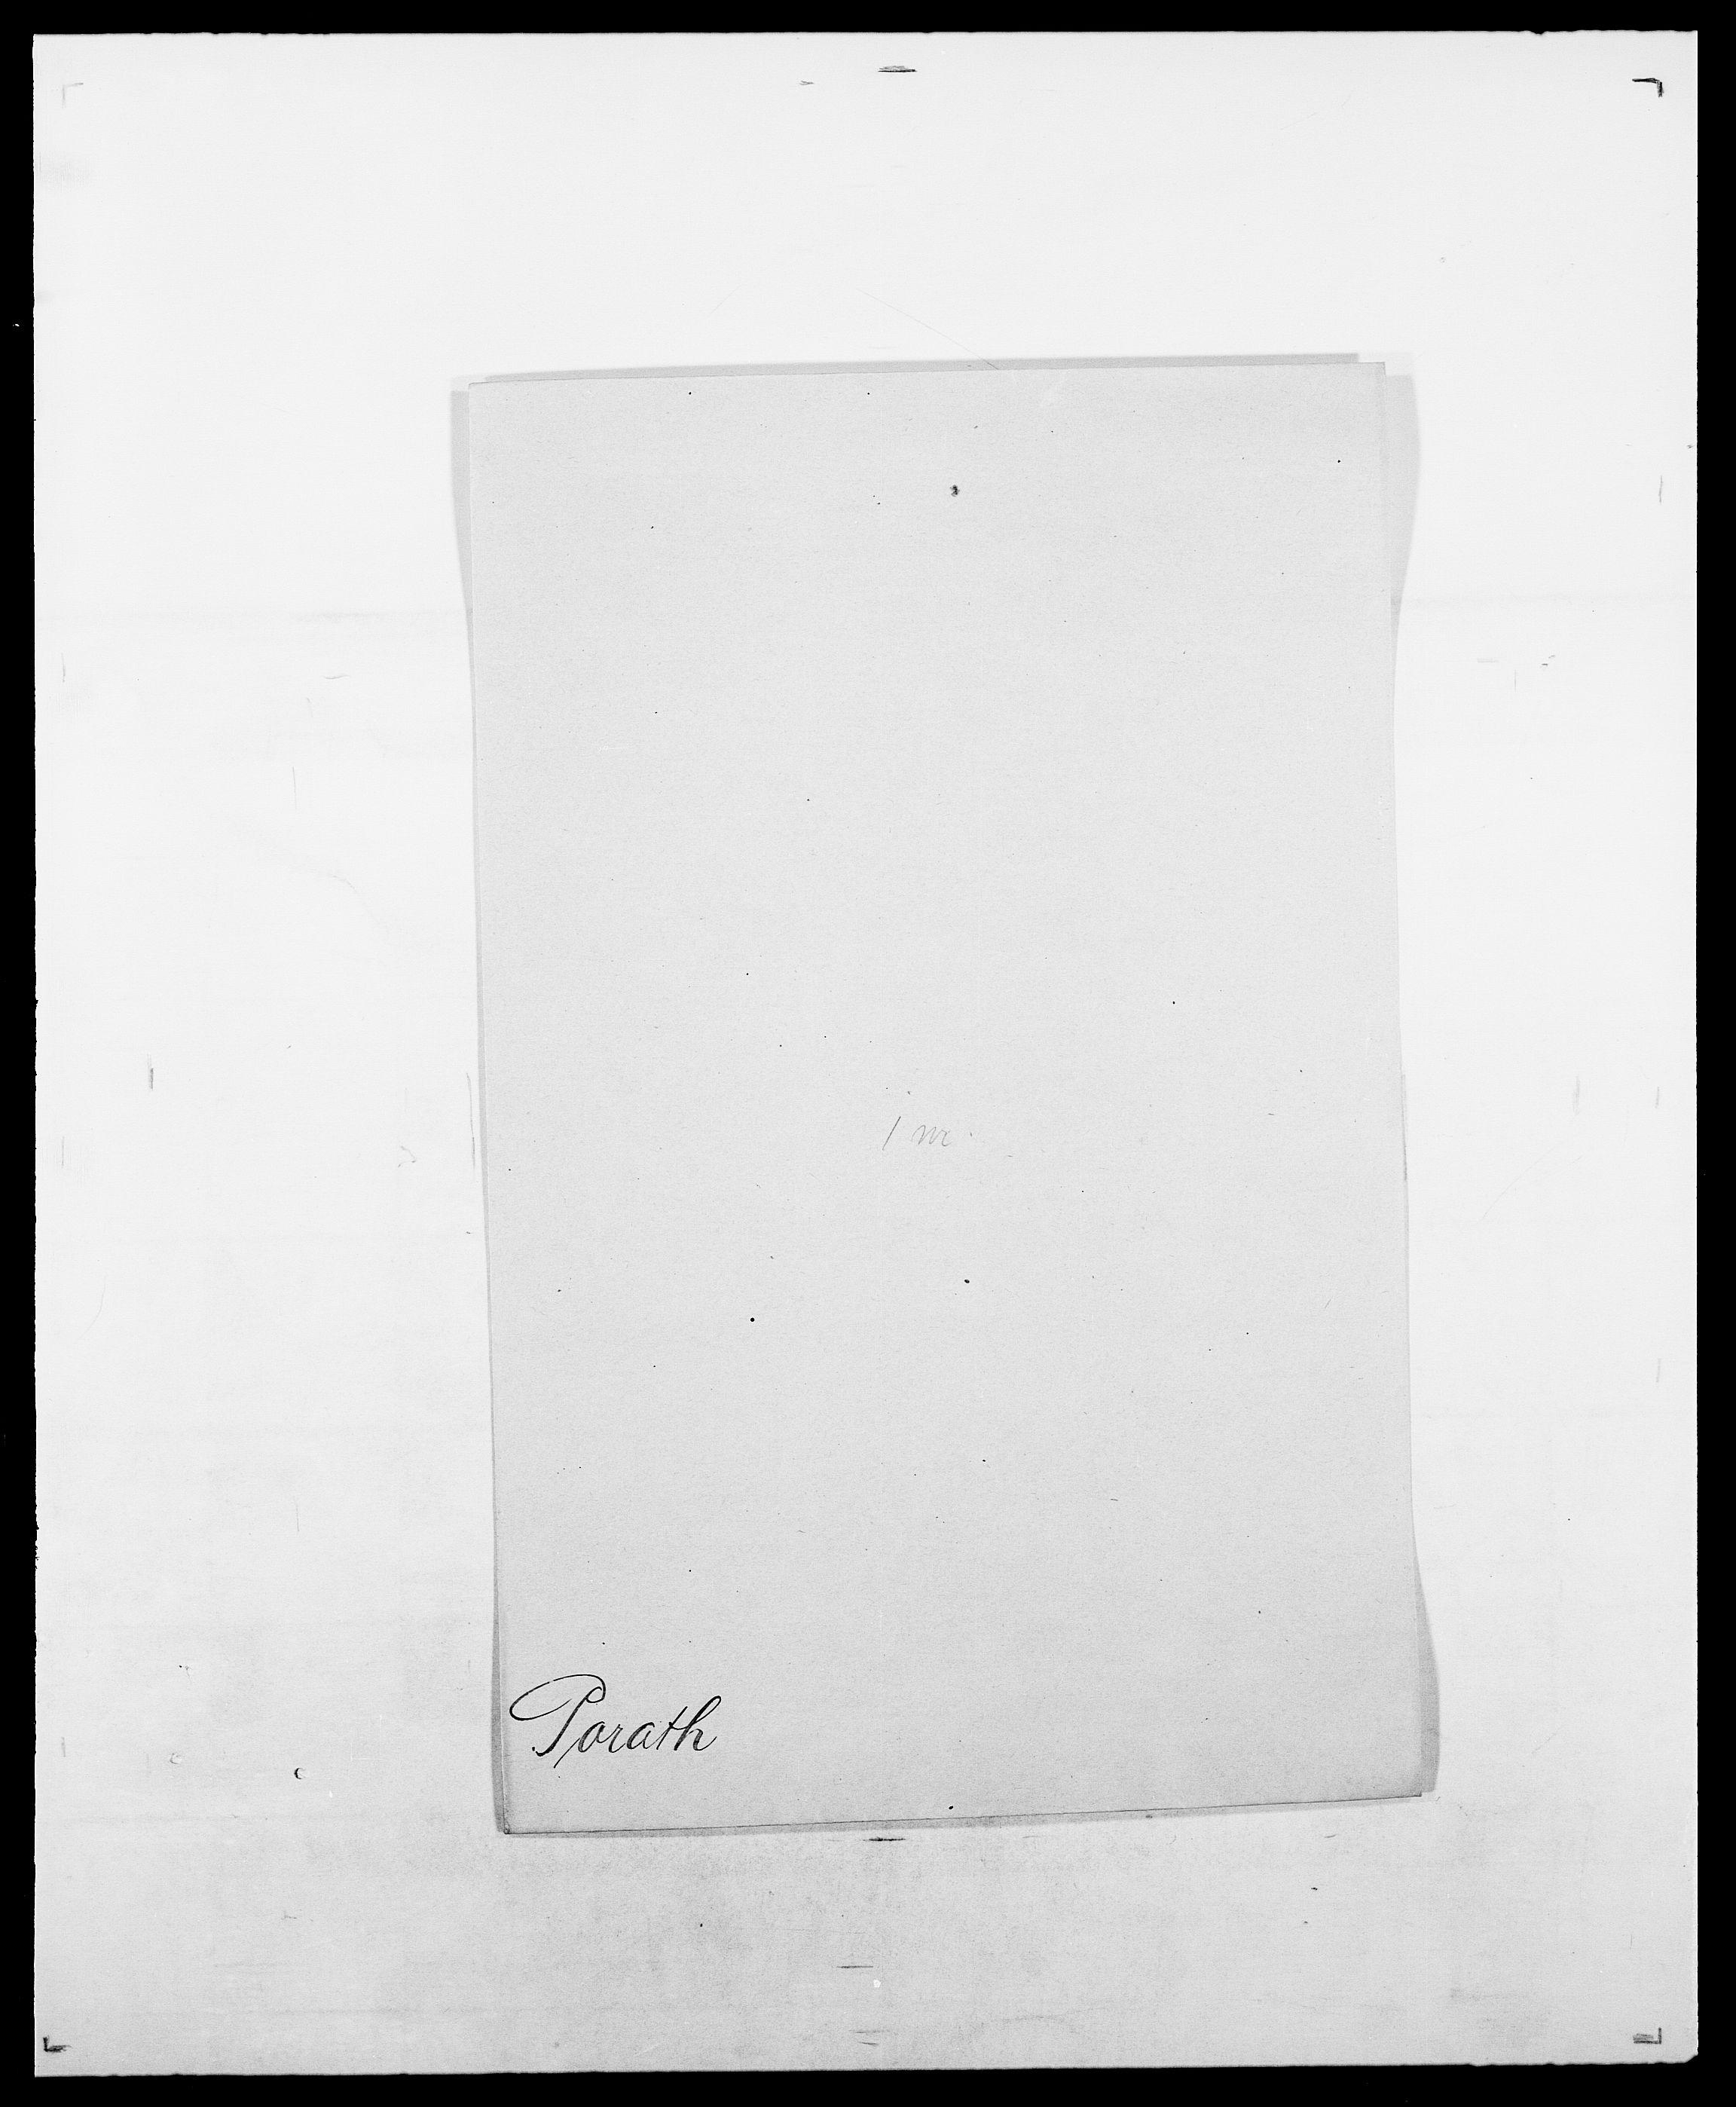 SAO, Delgobe, Charles Antoine - samling, D/Da/L0031: de Place - Raaum, s. 233